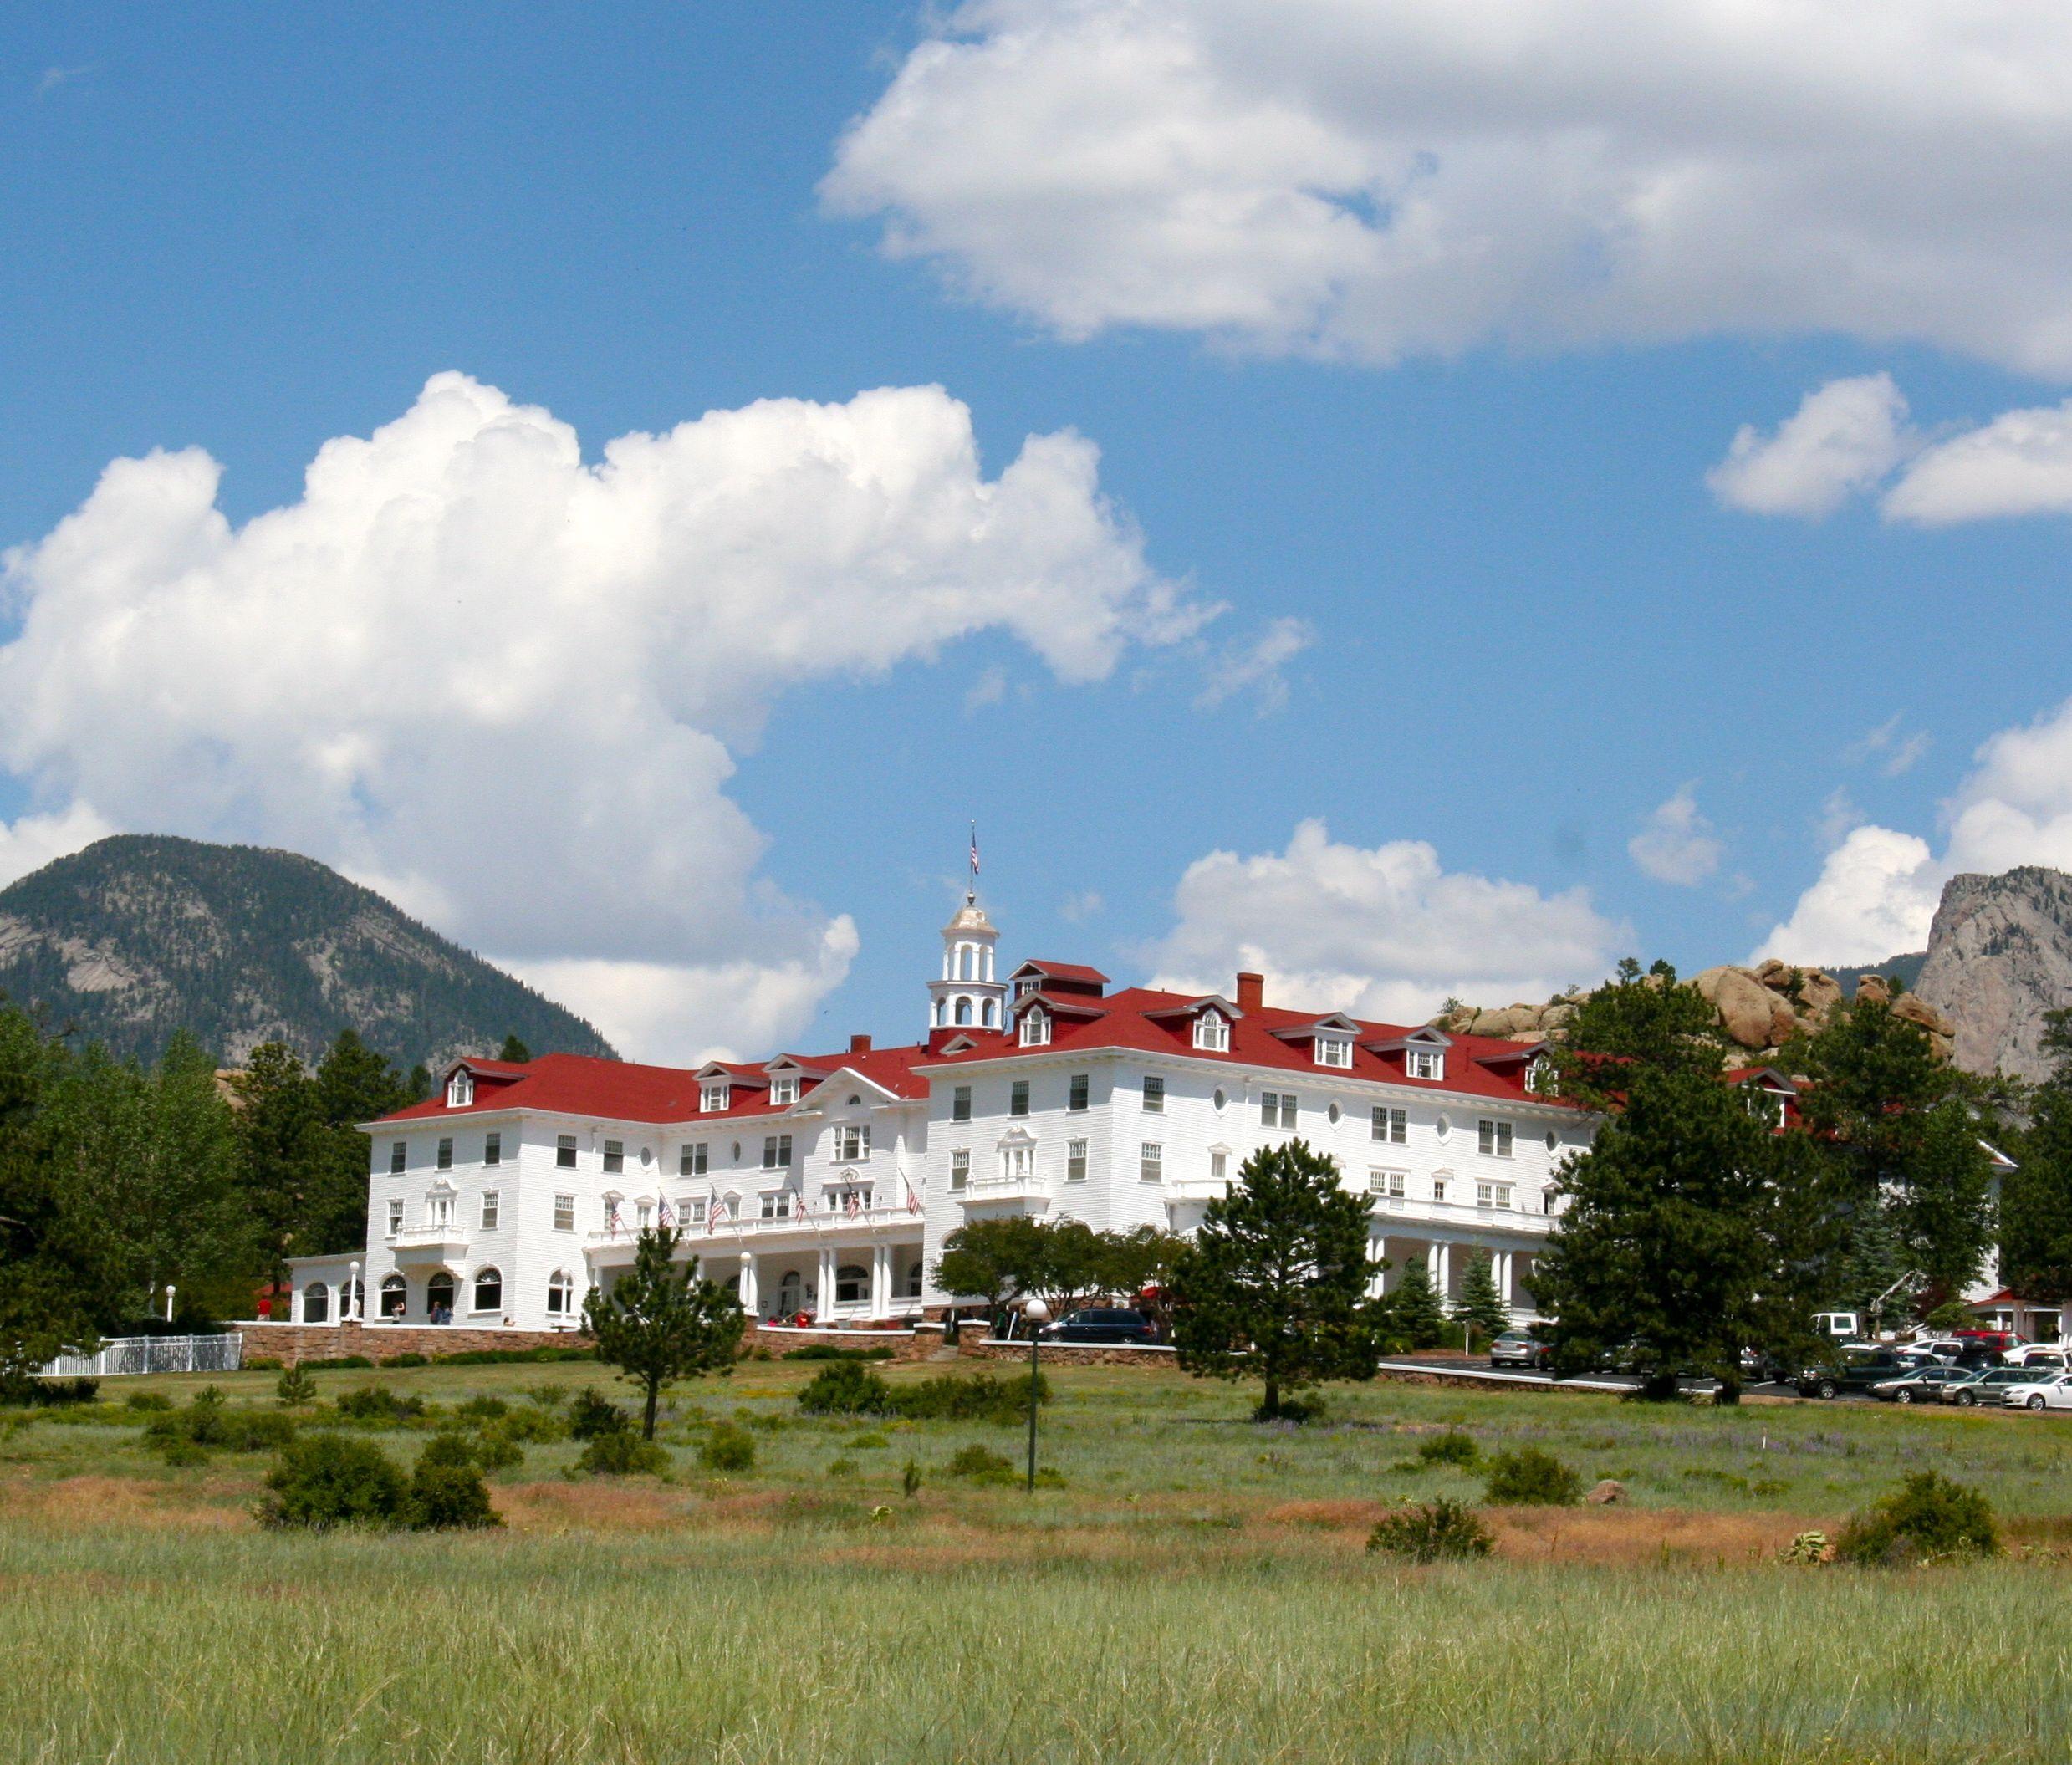 The Stanley Hotel Estes Park Colorado Where The Shining Was